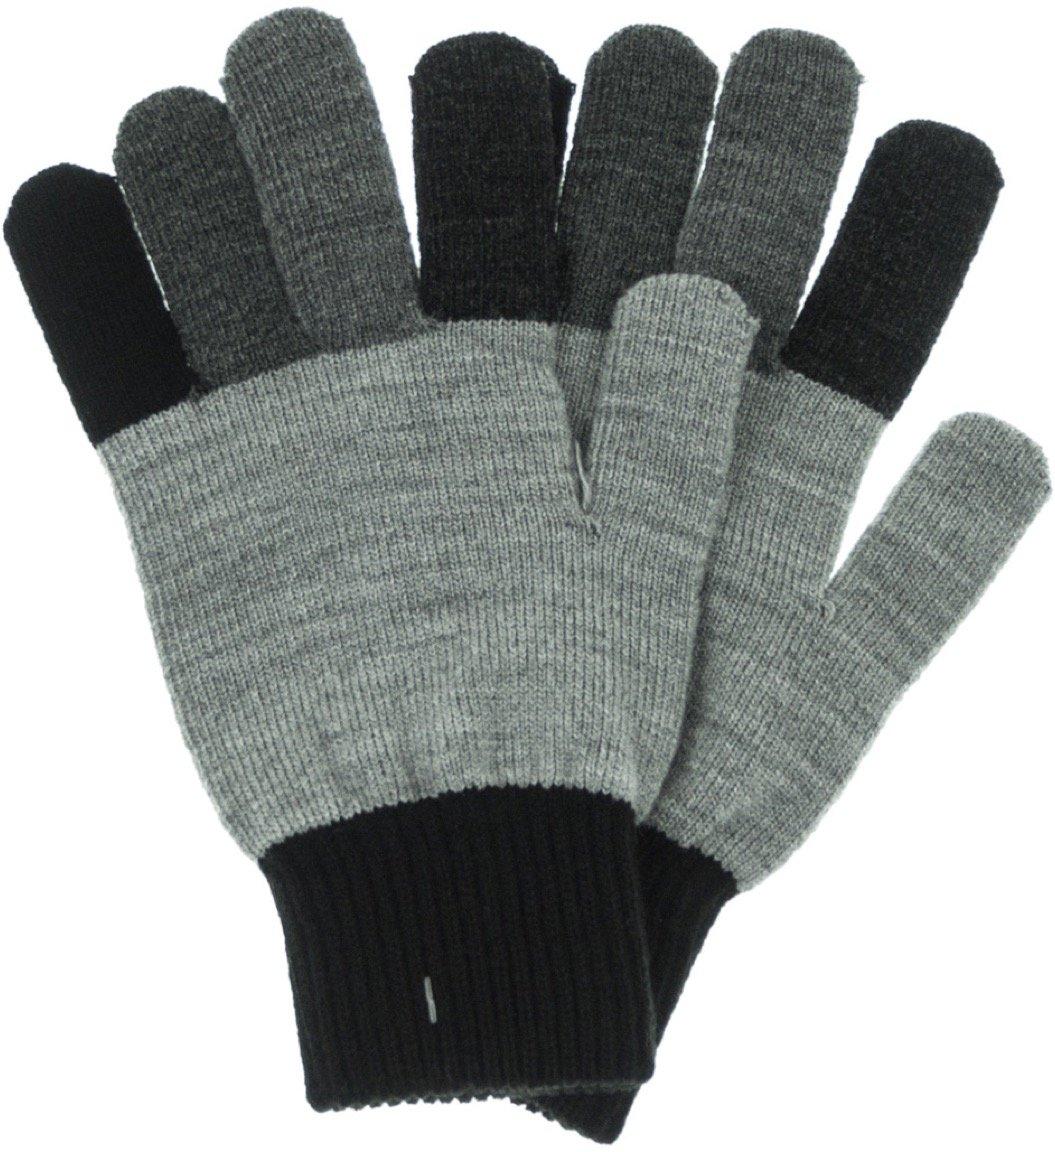 KDM παιδικά γάντια πλεκτά «Grey Simplicity»